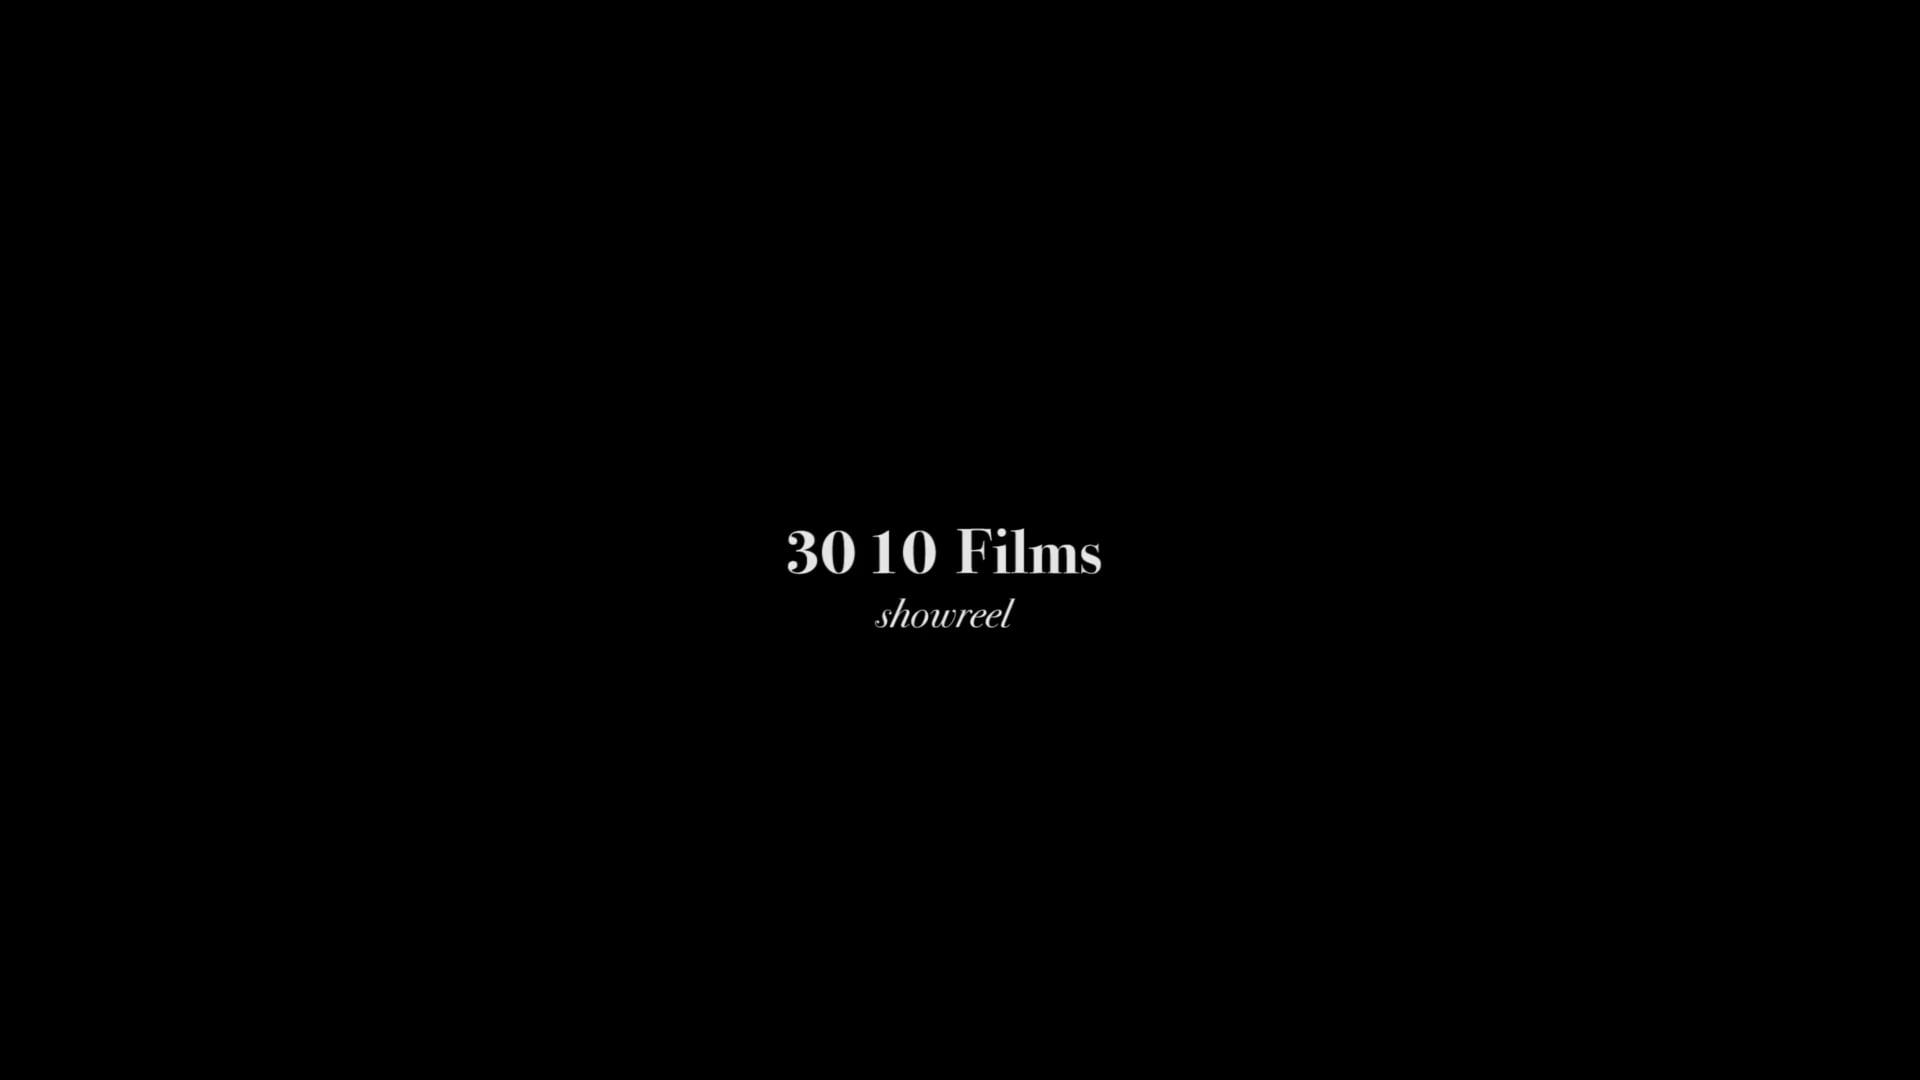 30 10 FILMS SHOWREEL / 2019